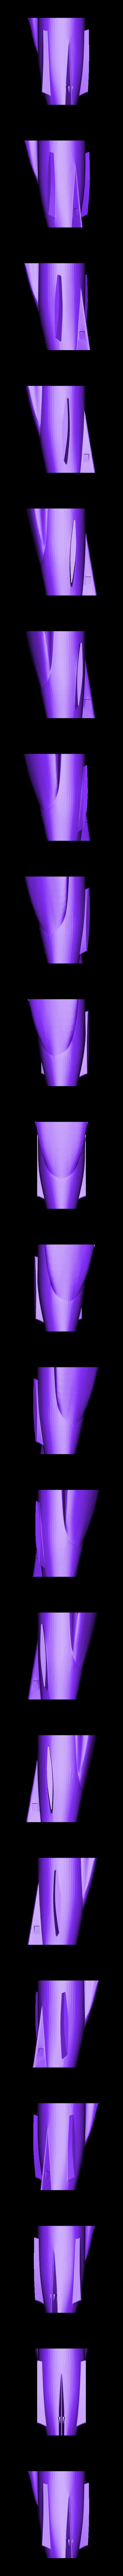 Mid3.STL Download STL file Phenom 300 • Template to 3D print, Eduardohbm